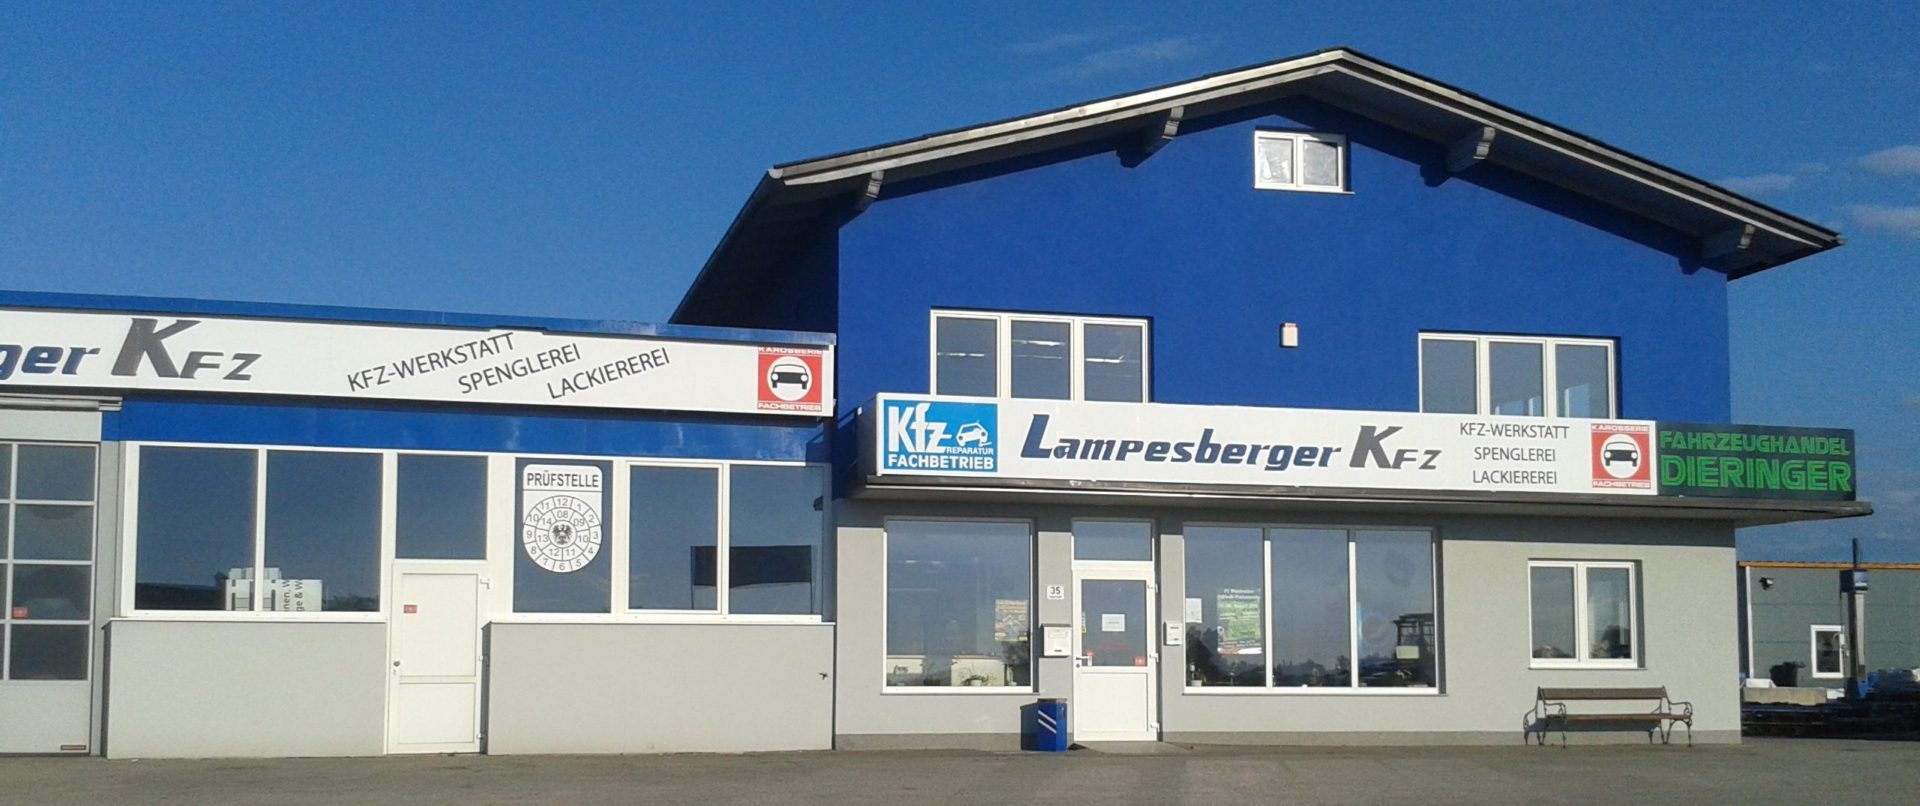 Lampesberger Kfz